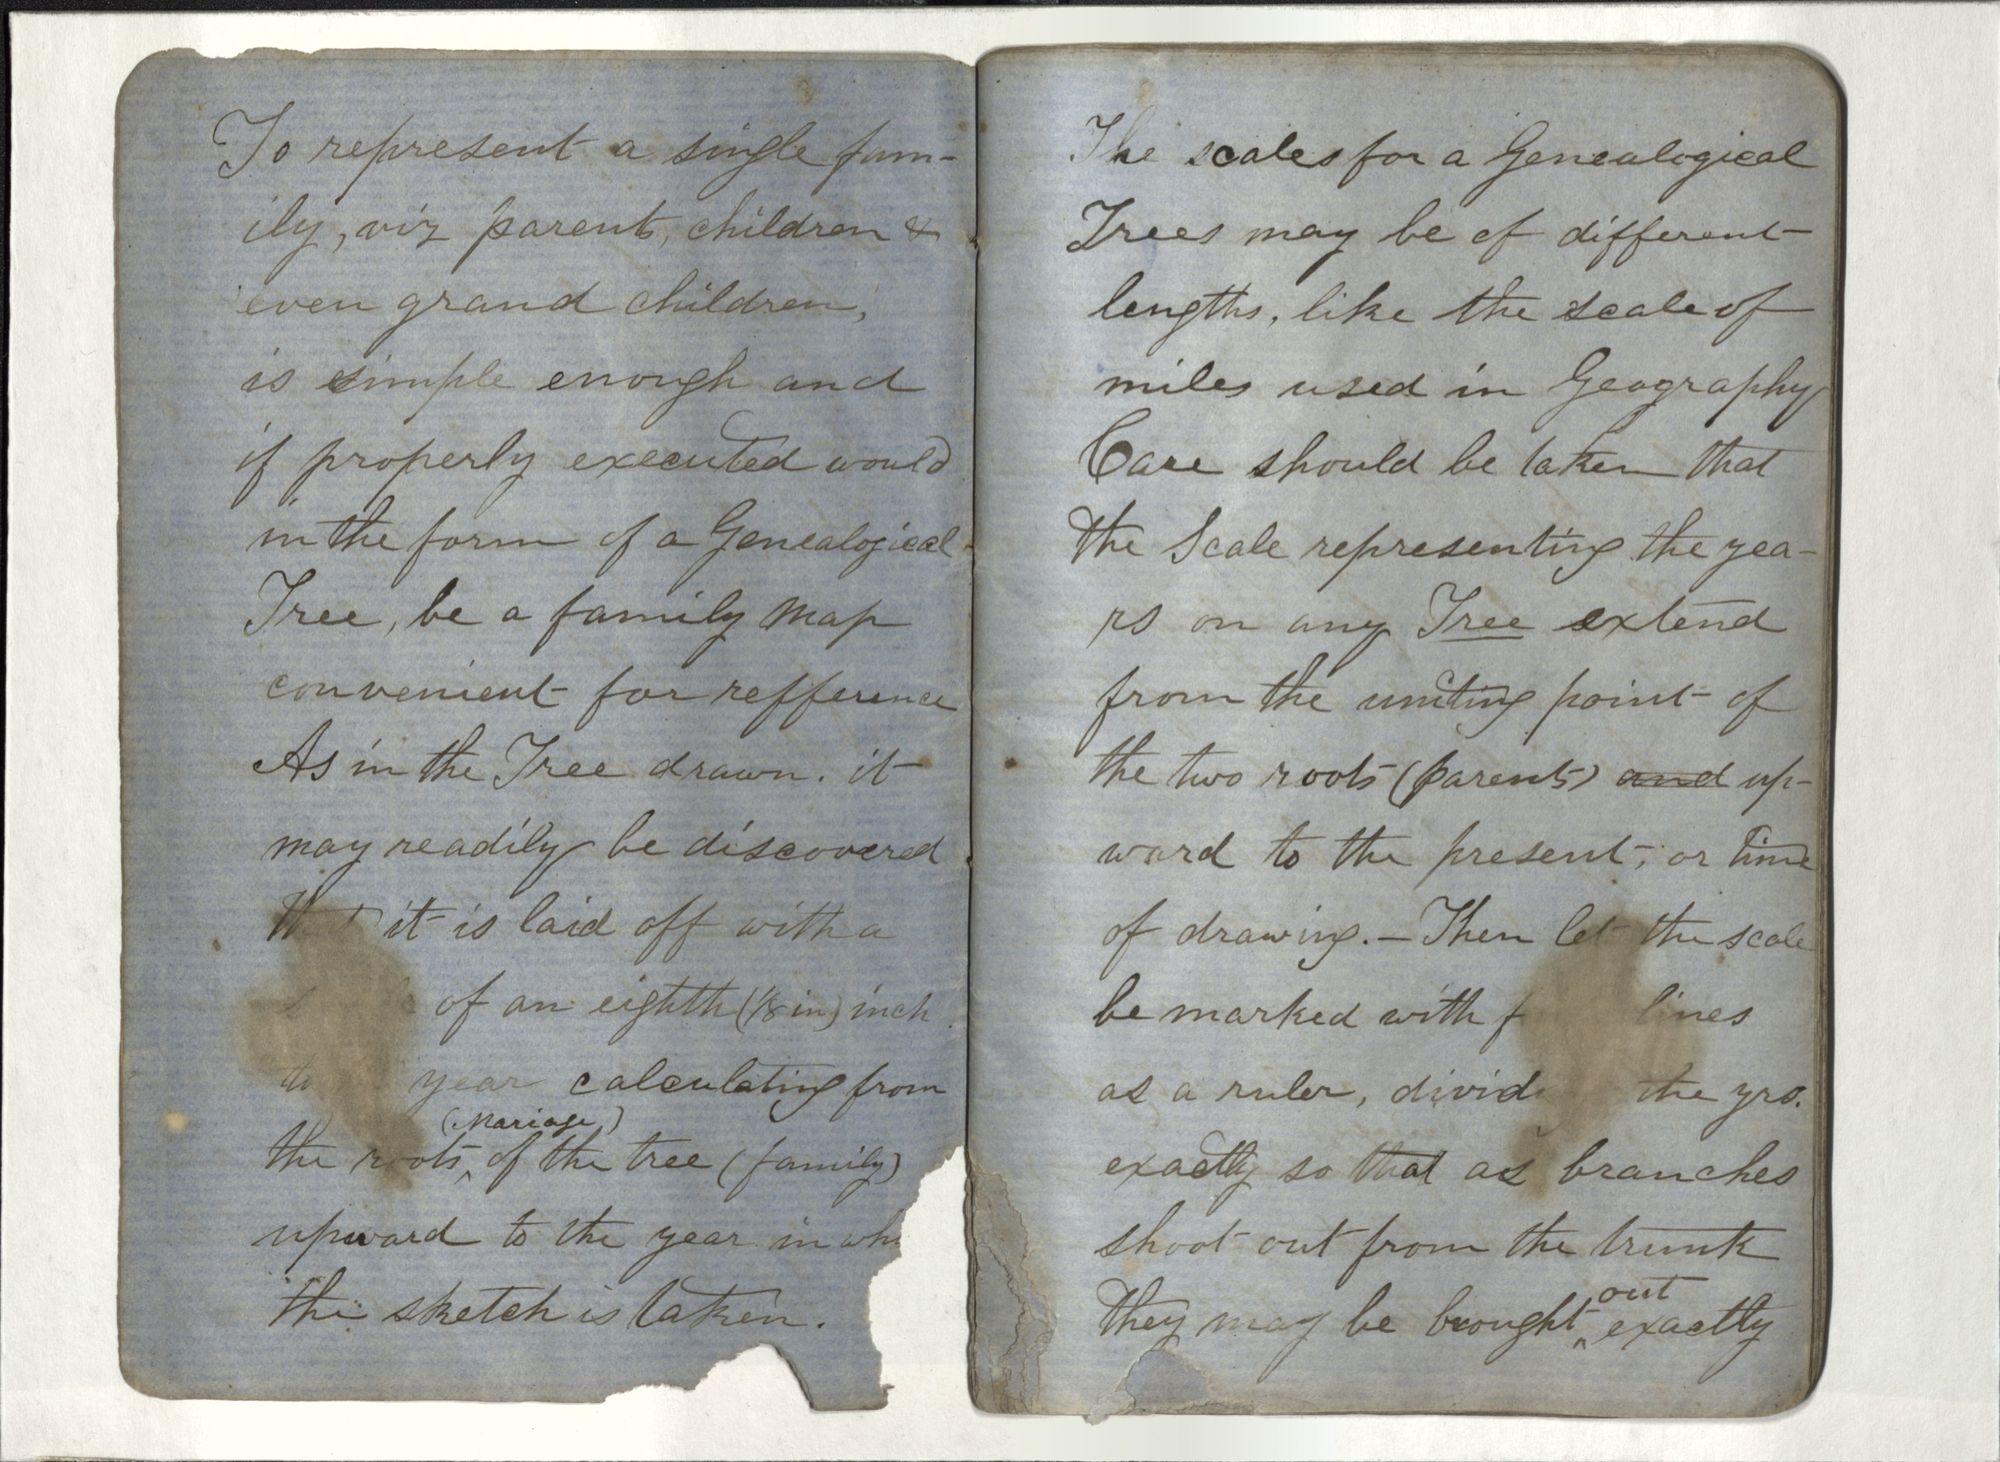 Blue Journal, John Henning Woods, 1864 (Ms2017-030)